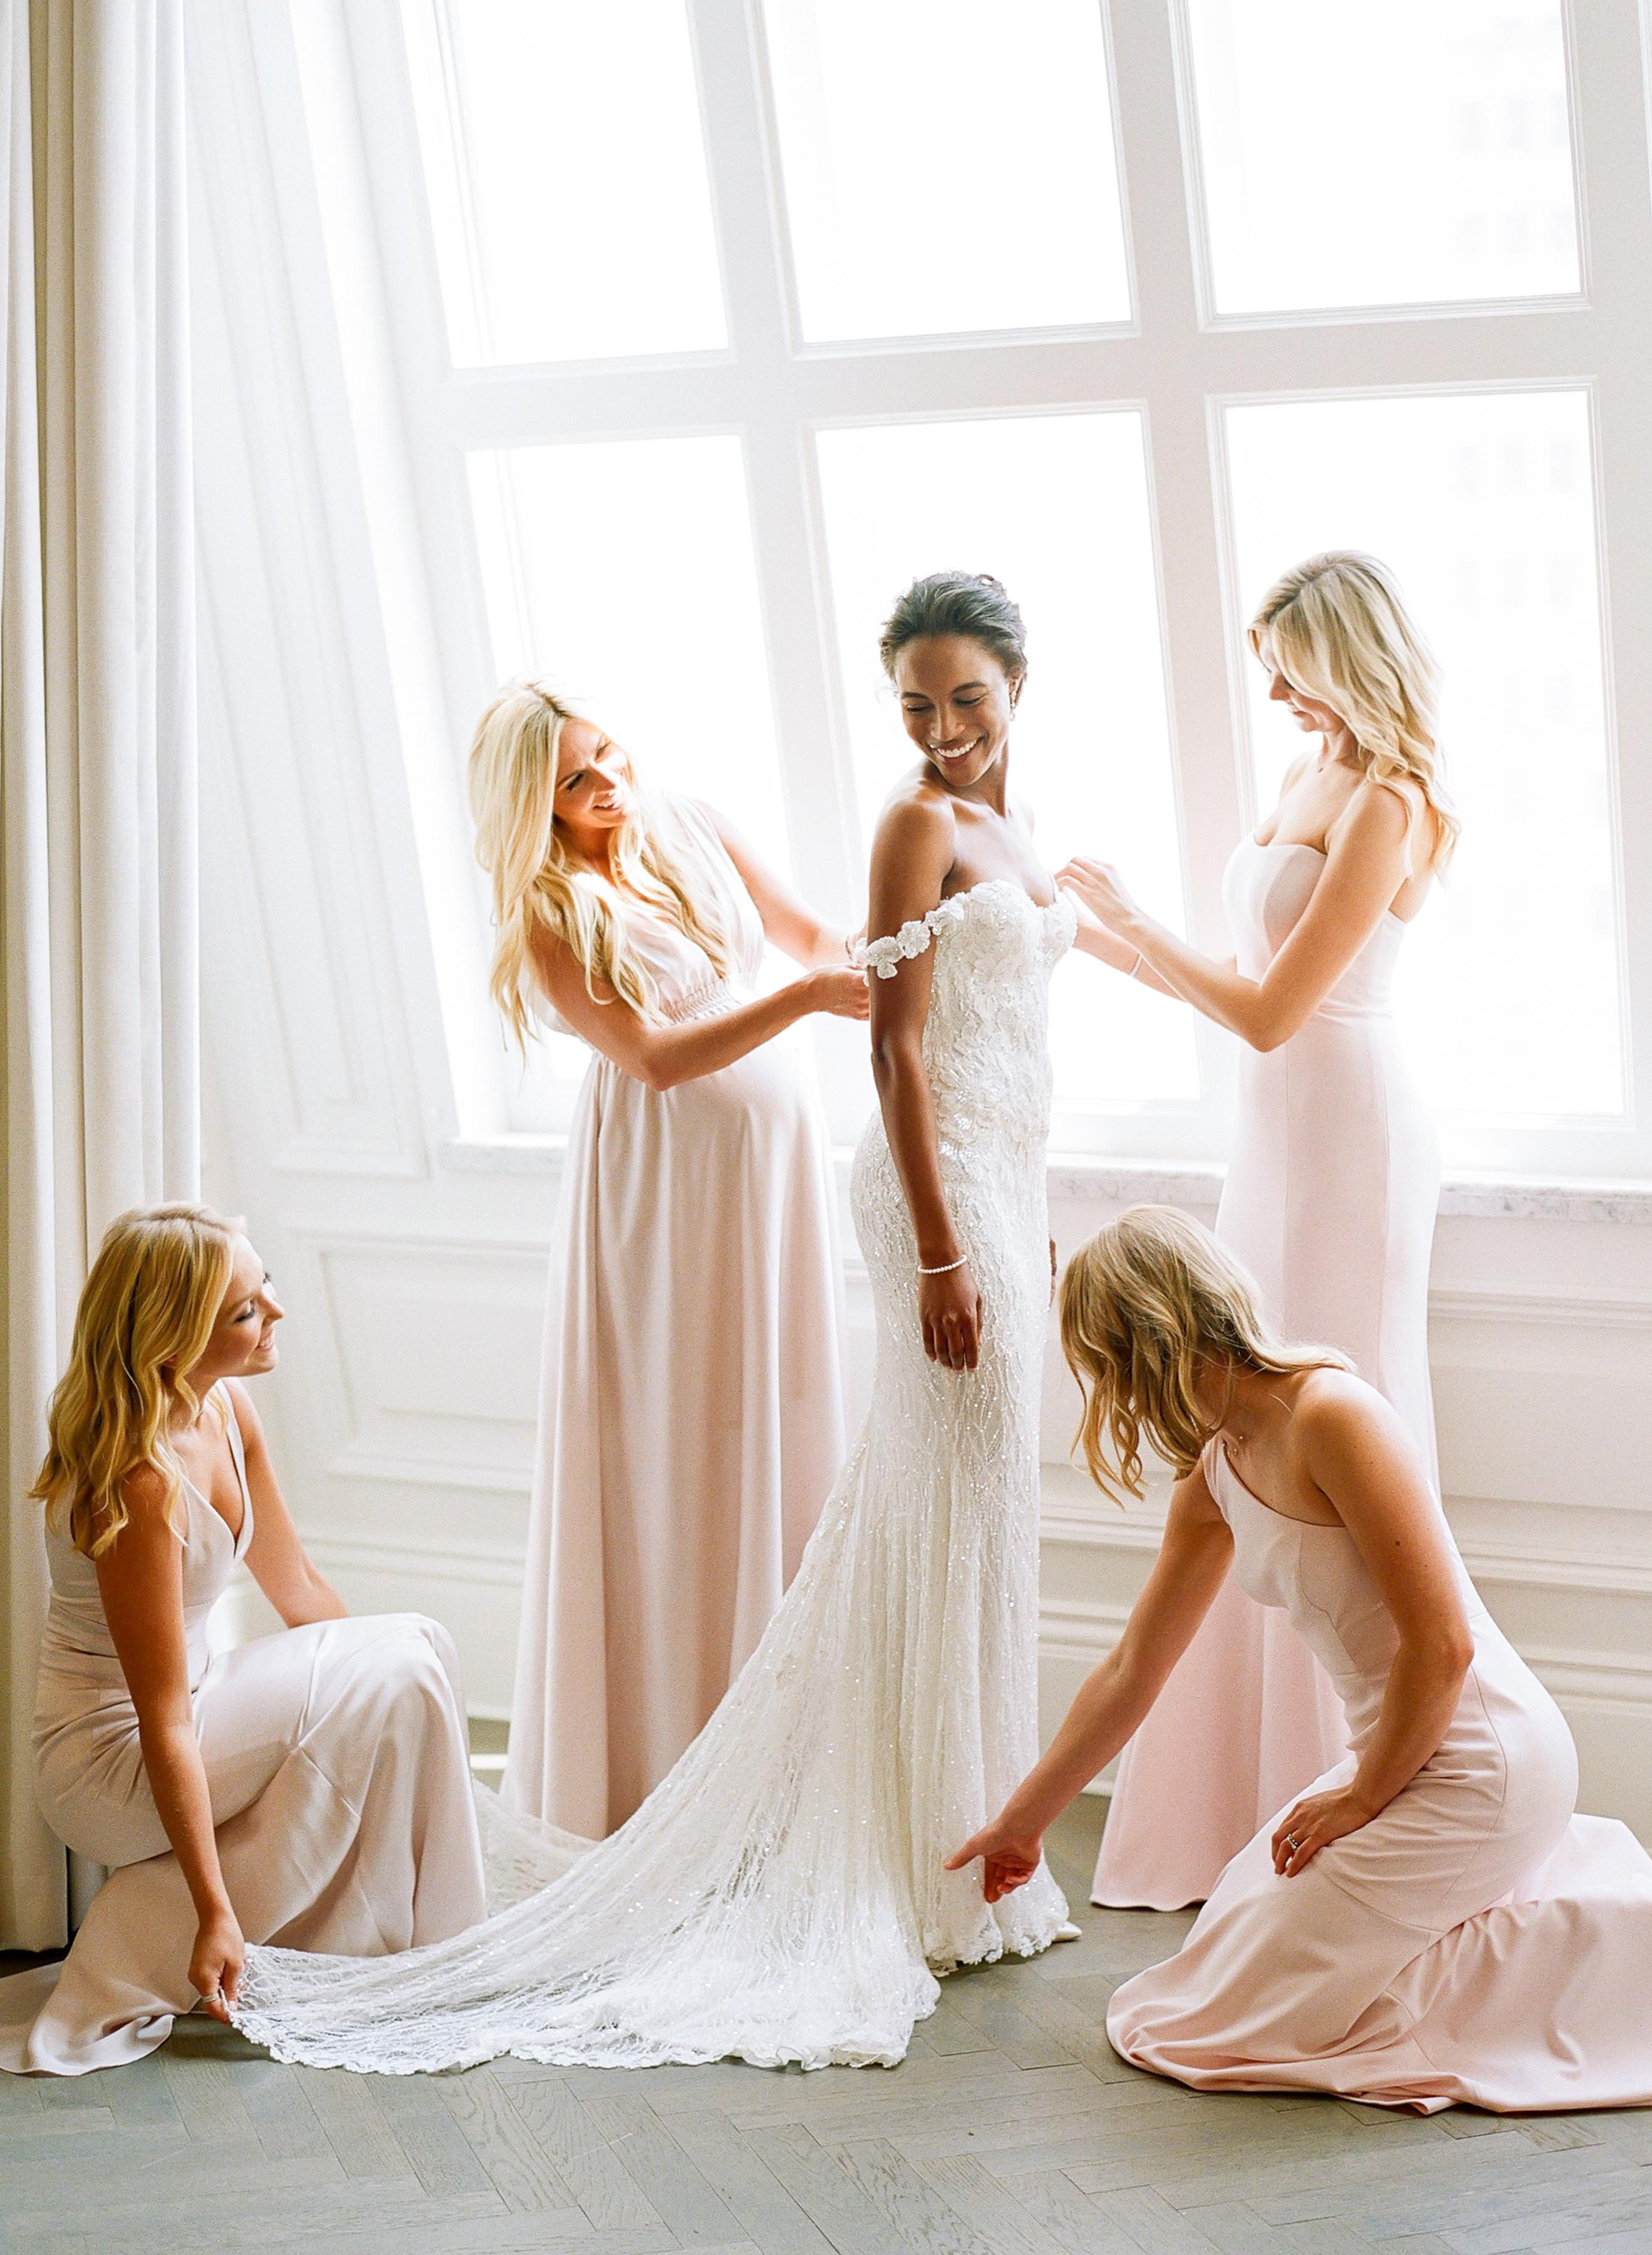 olivia colling wedding bride with bridesmaids ini blush dresses